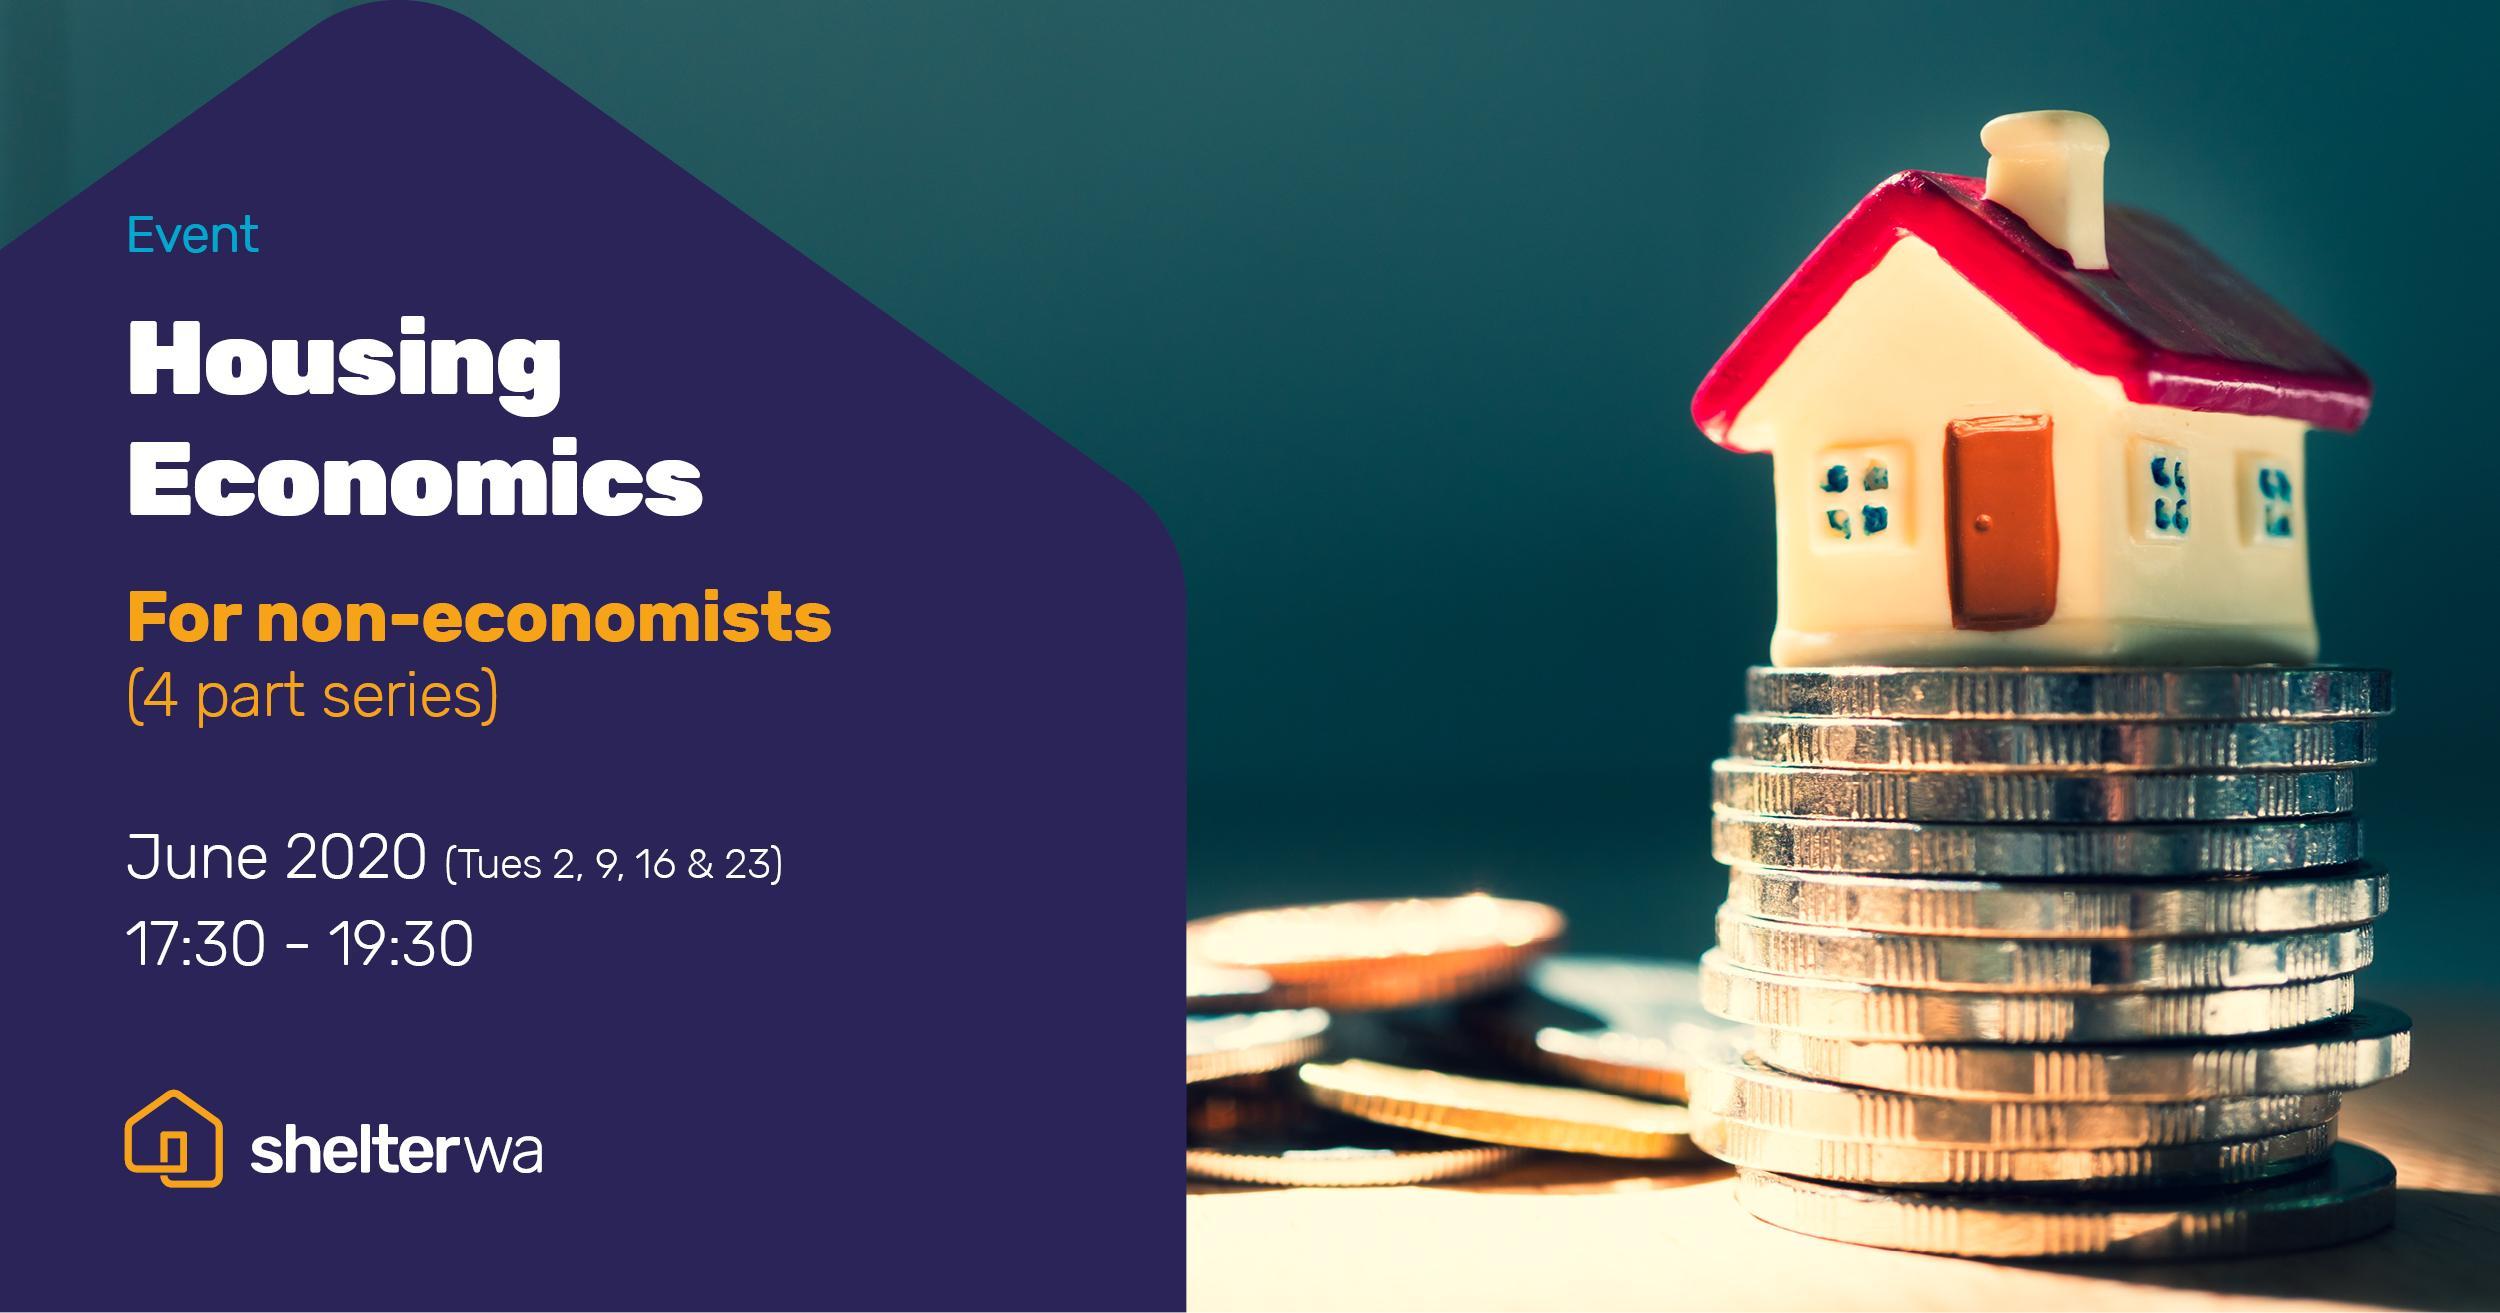 Housing Economics - For non-economists 2020